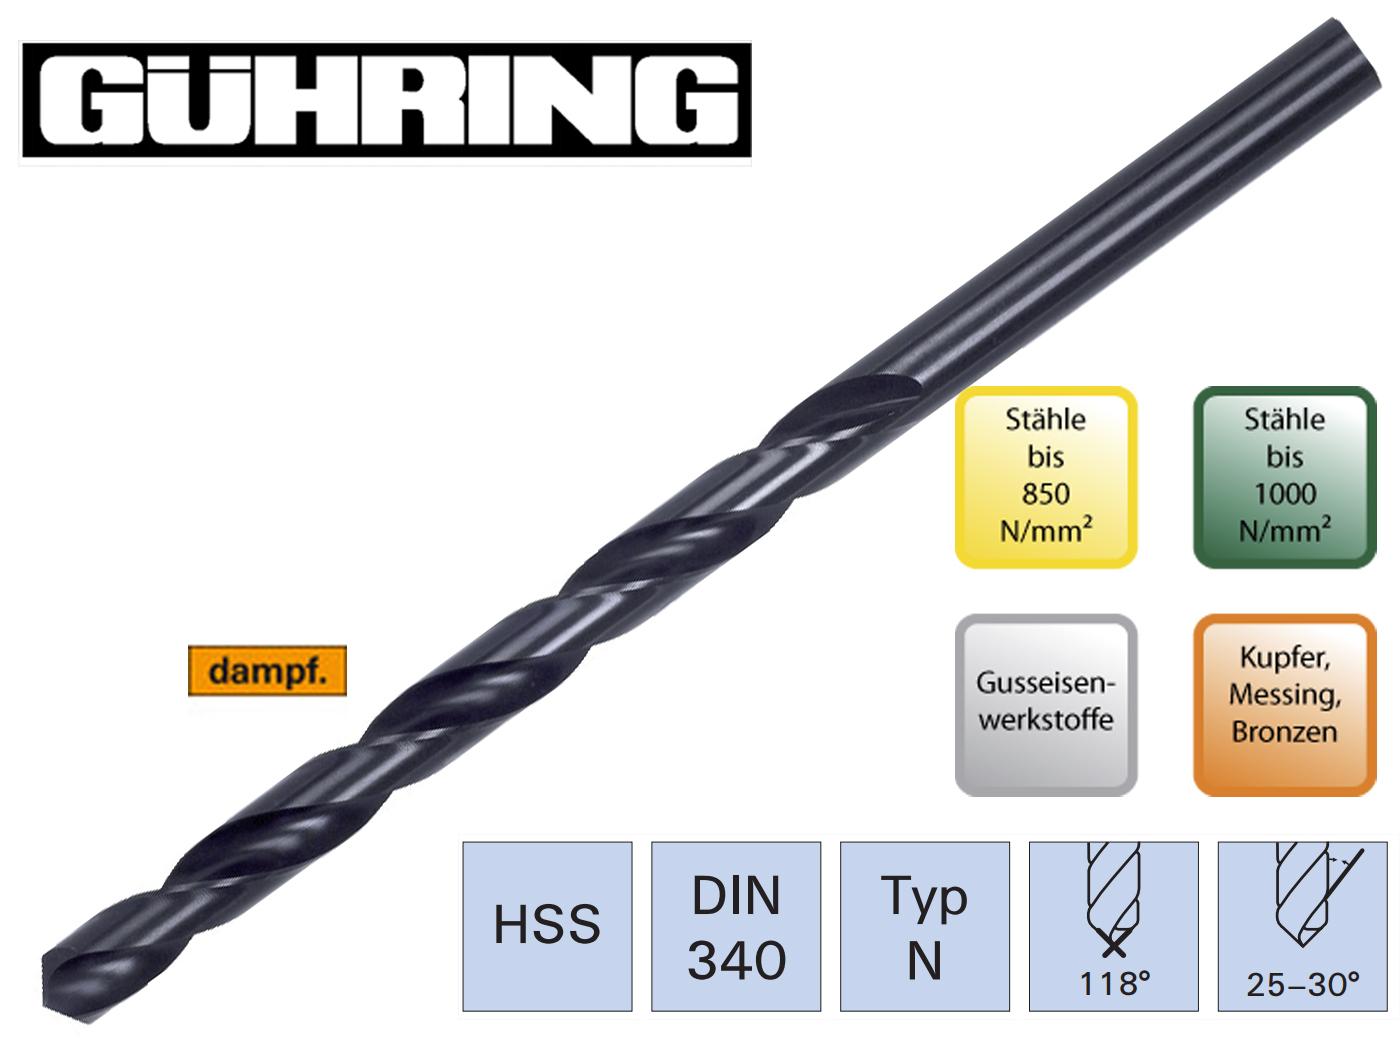 Spiraalboor DIN 340 N HSS geslepen Guhring | DKMTools - DKM Tools